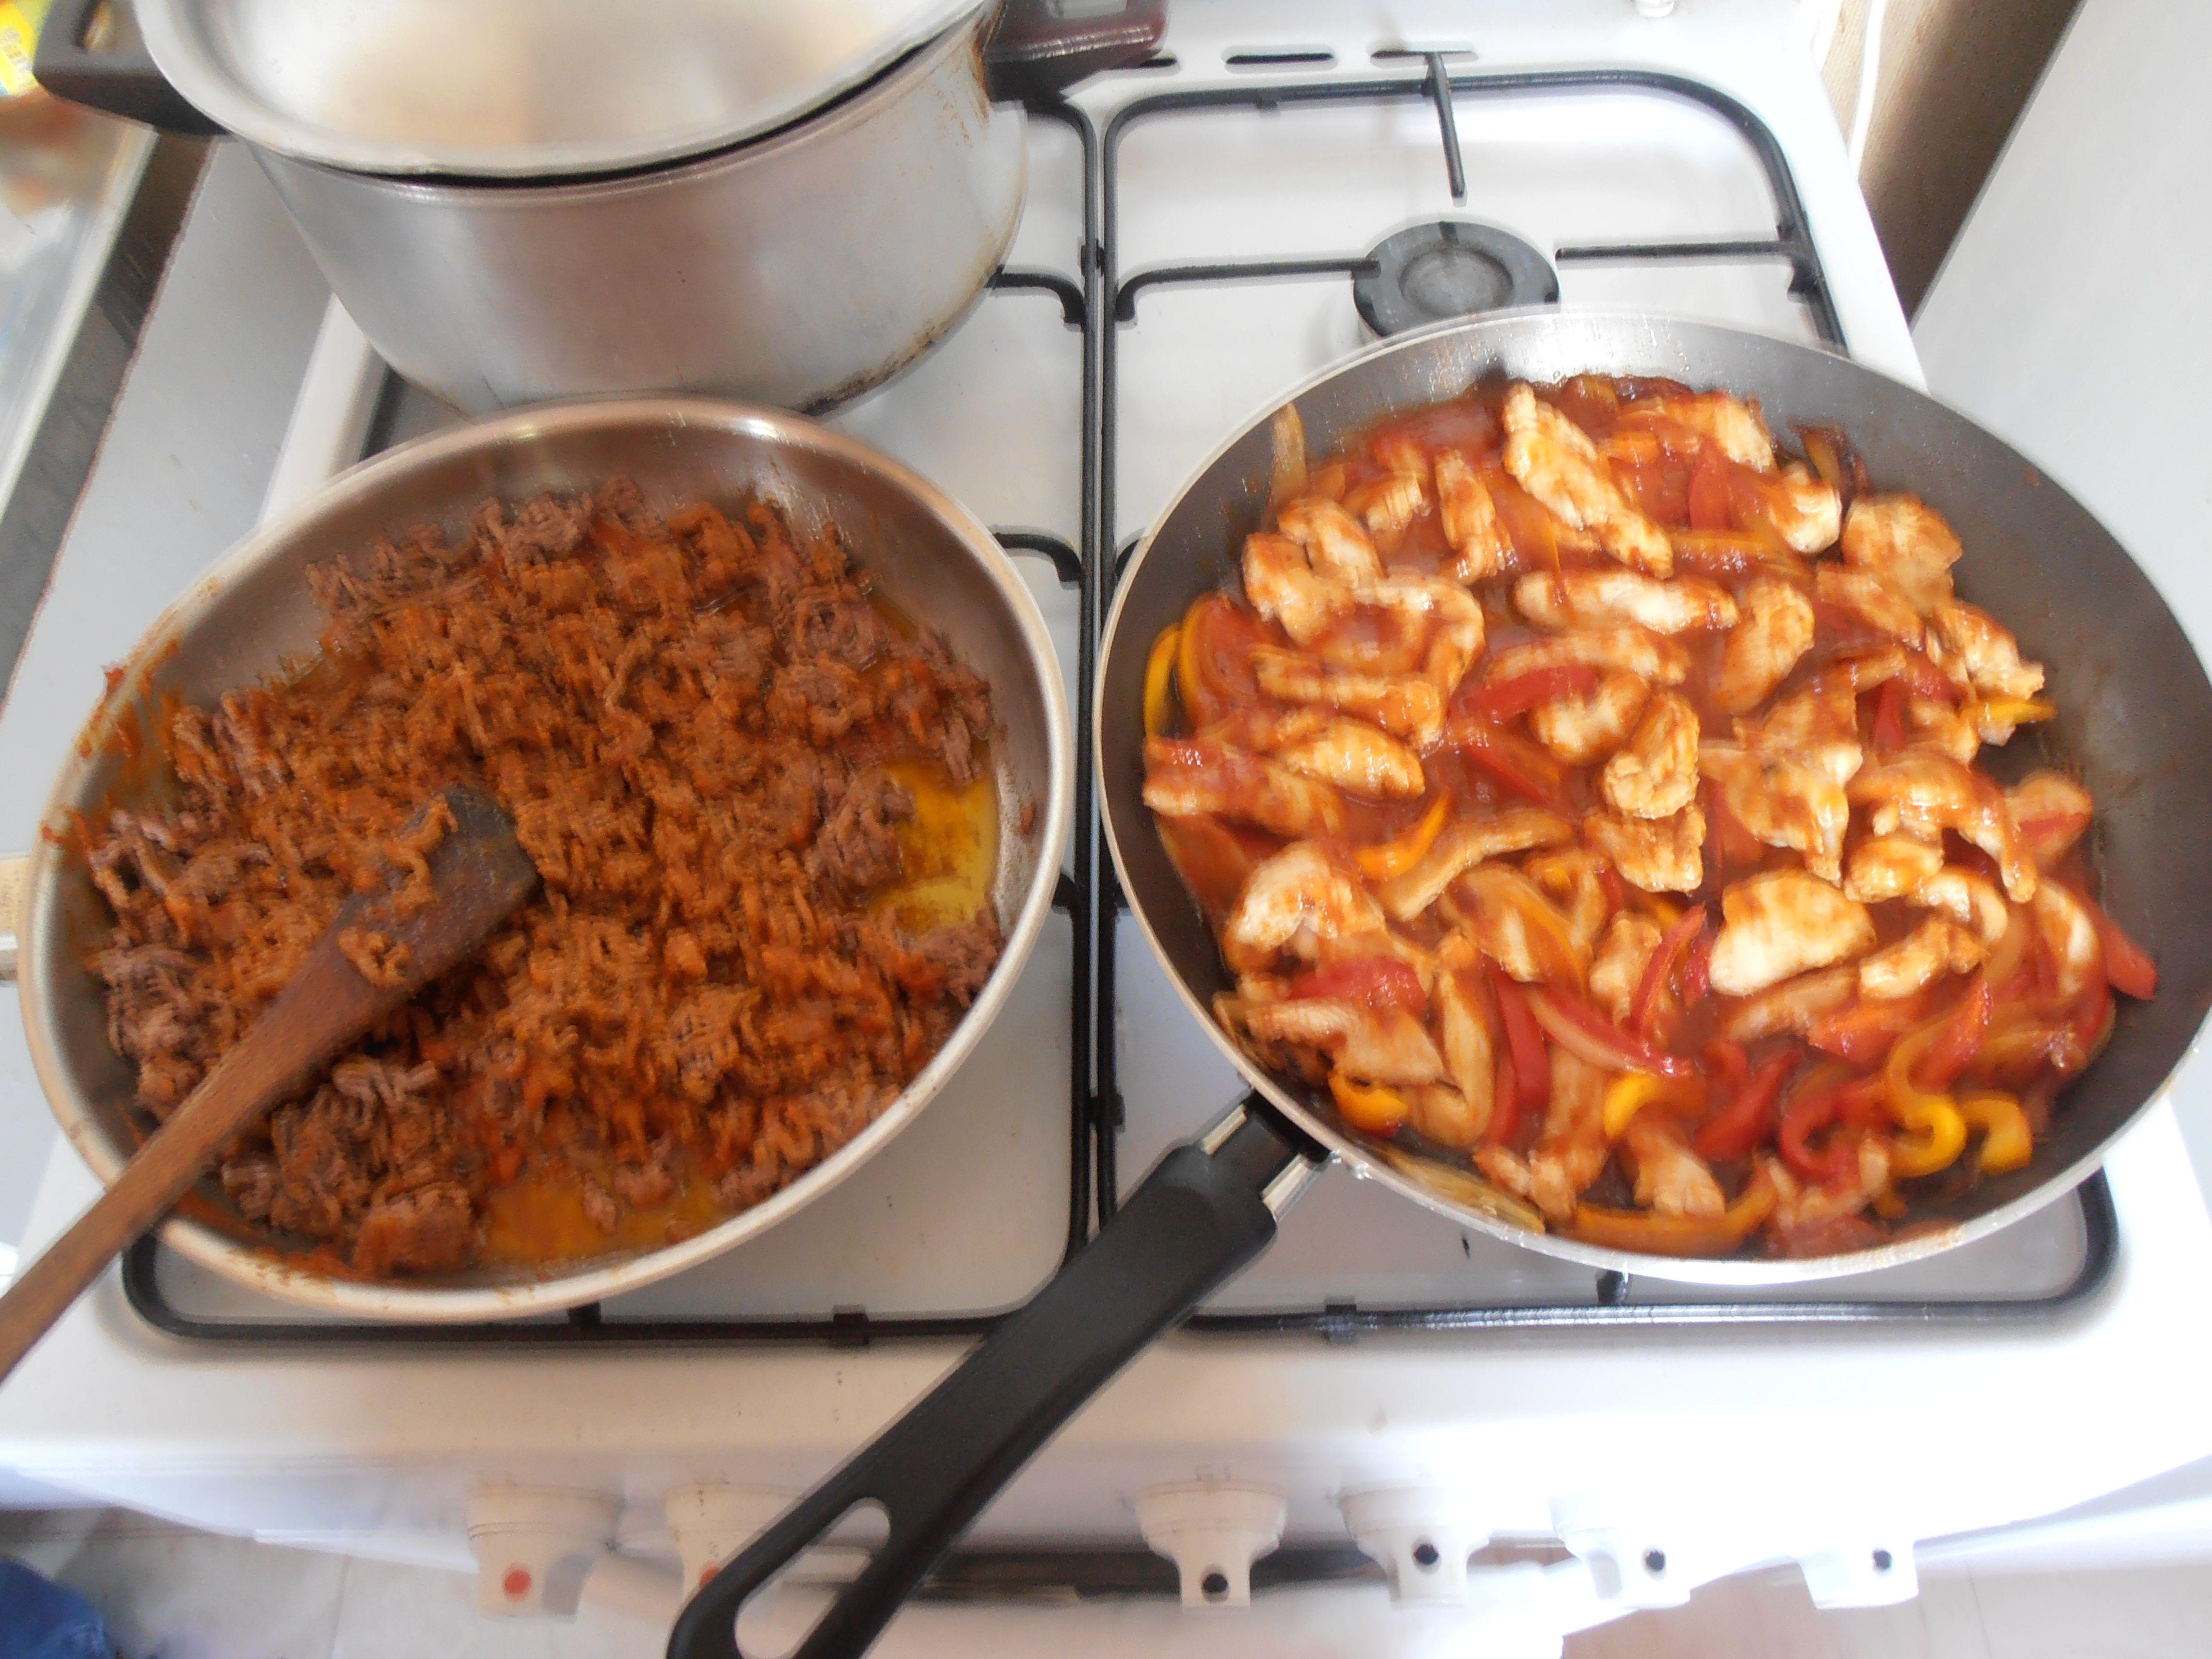 Garnitre pour tacos et fajitas en mode test #LesieurSampleo #DuoLesieur #DuoHuileBeurre